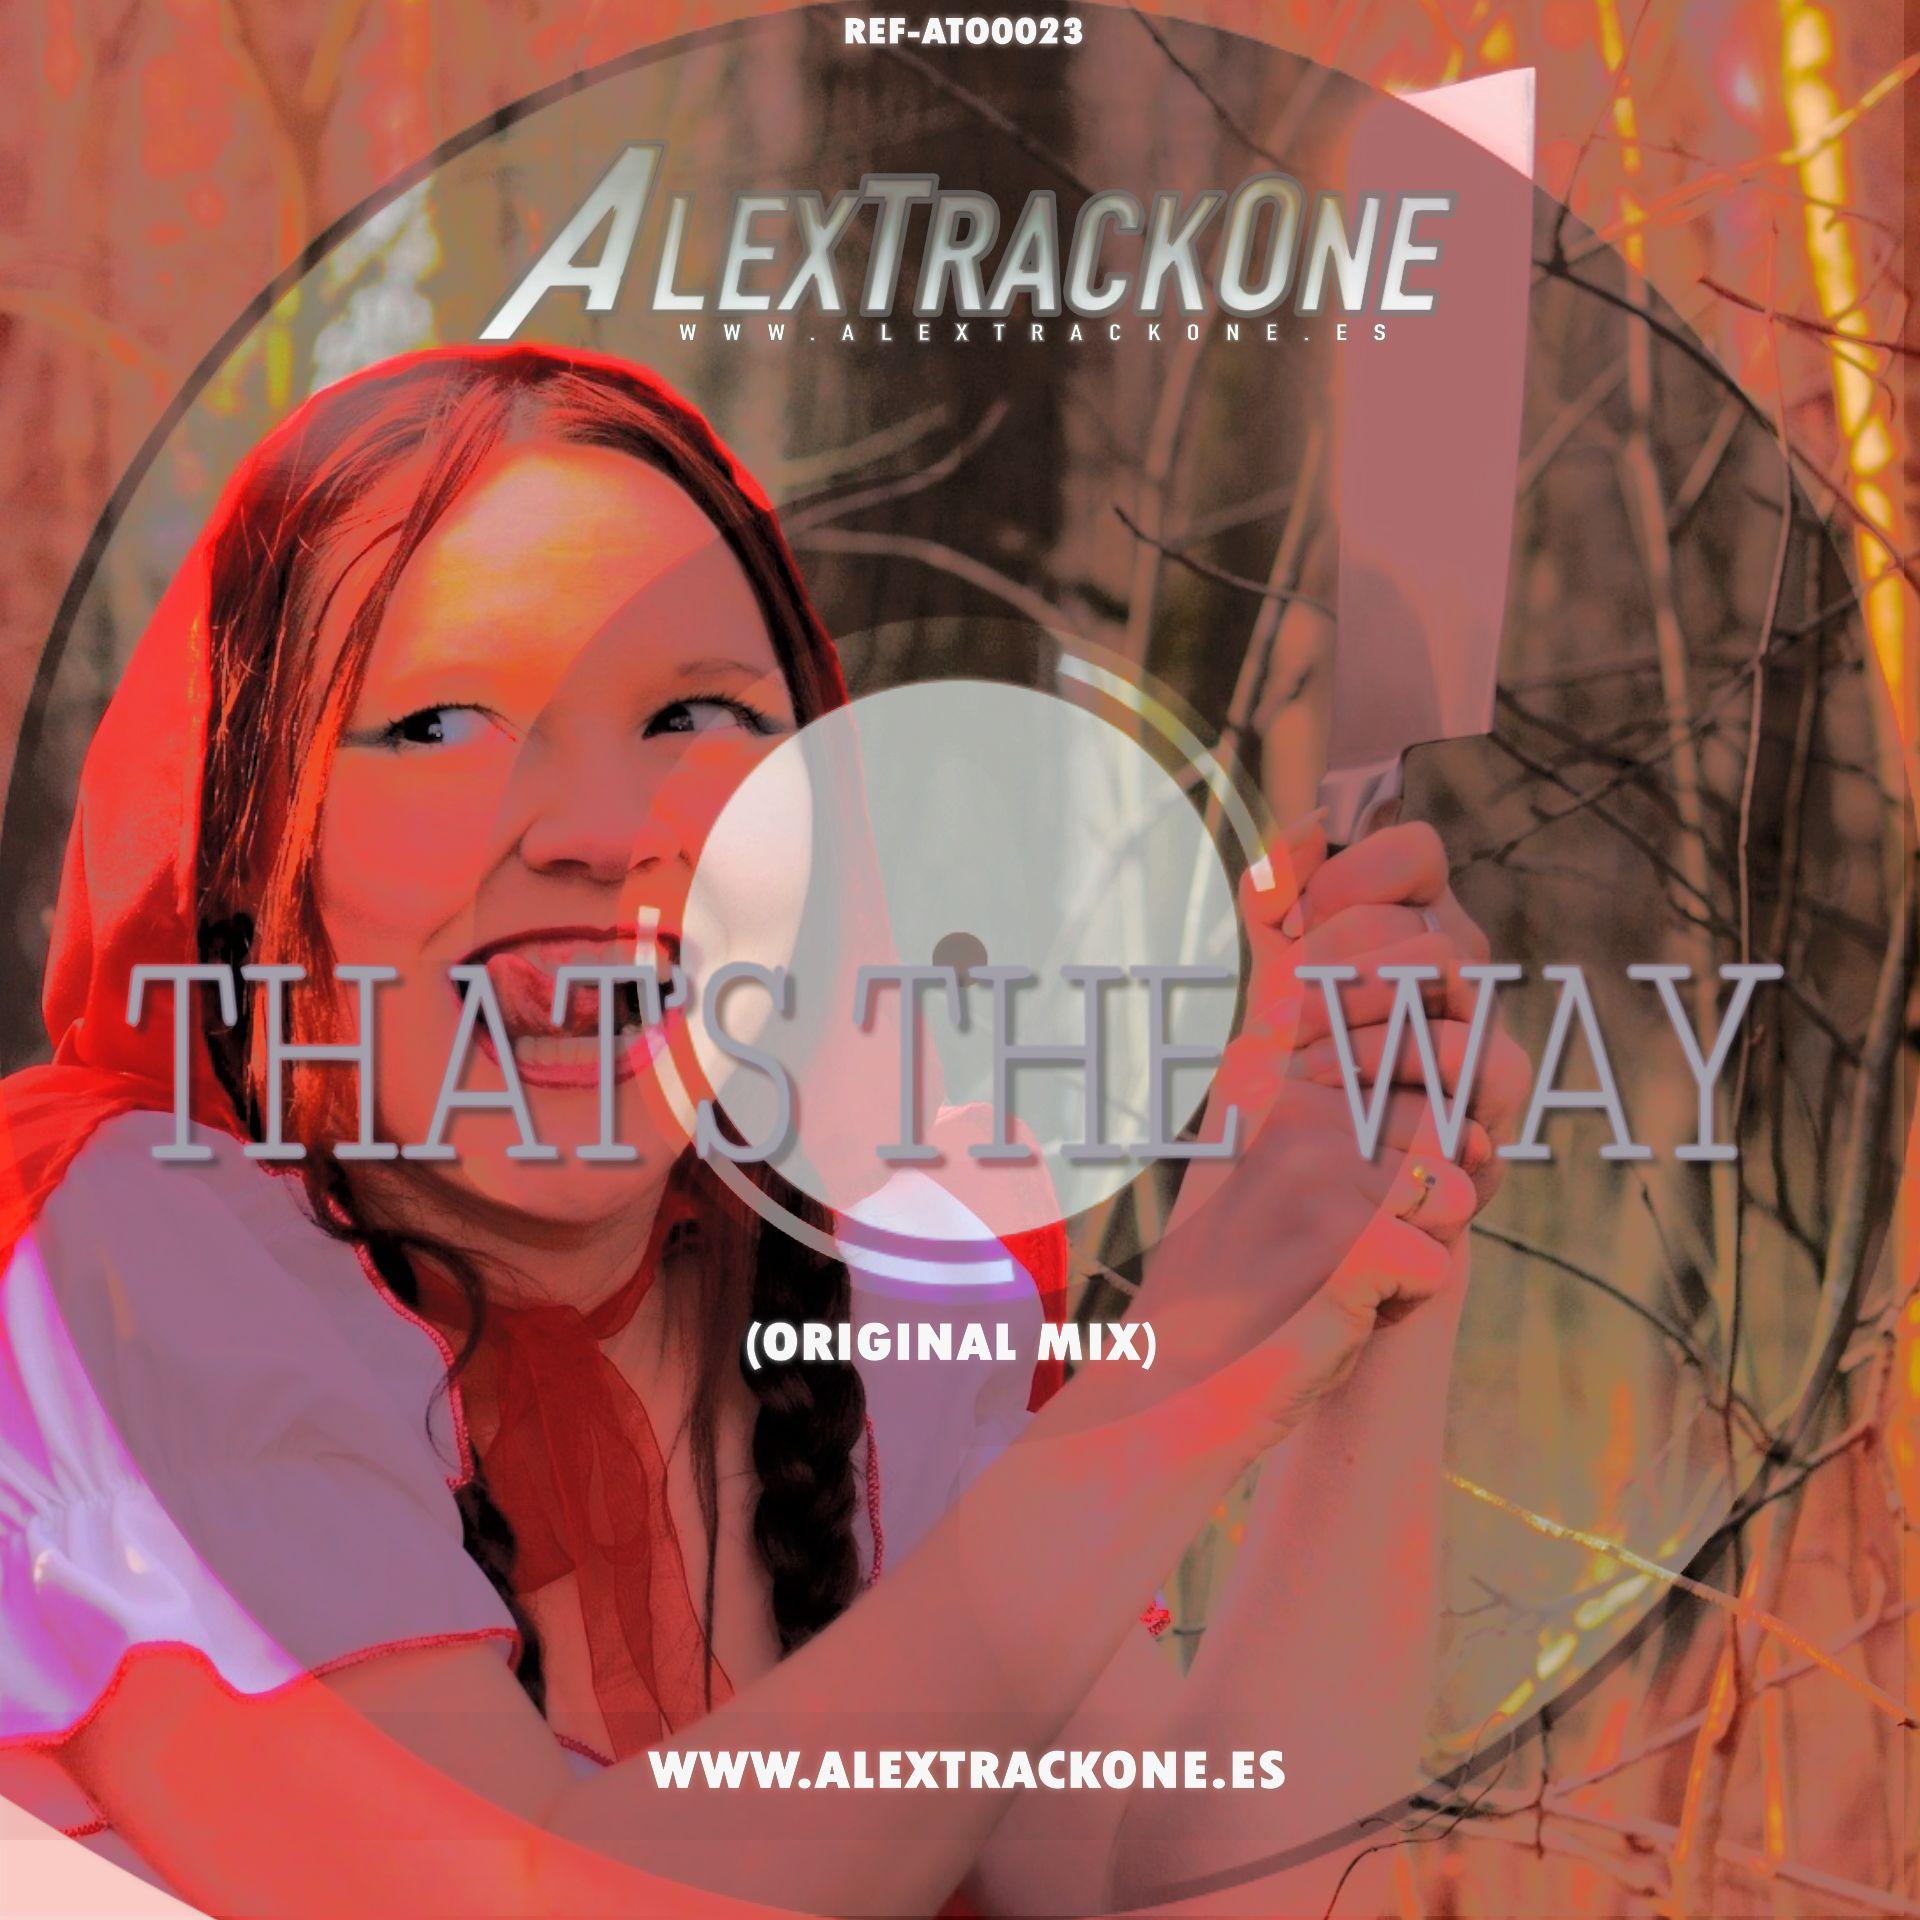 REF-ATO0023 THATS THE WAY (ORIGINAL MIX) (MP3 & WAV)